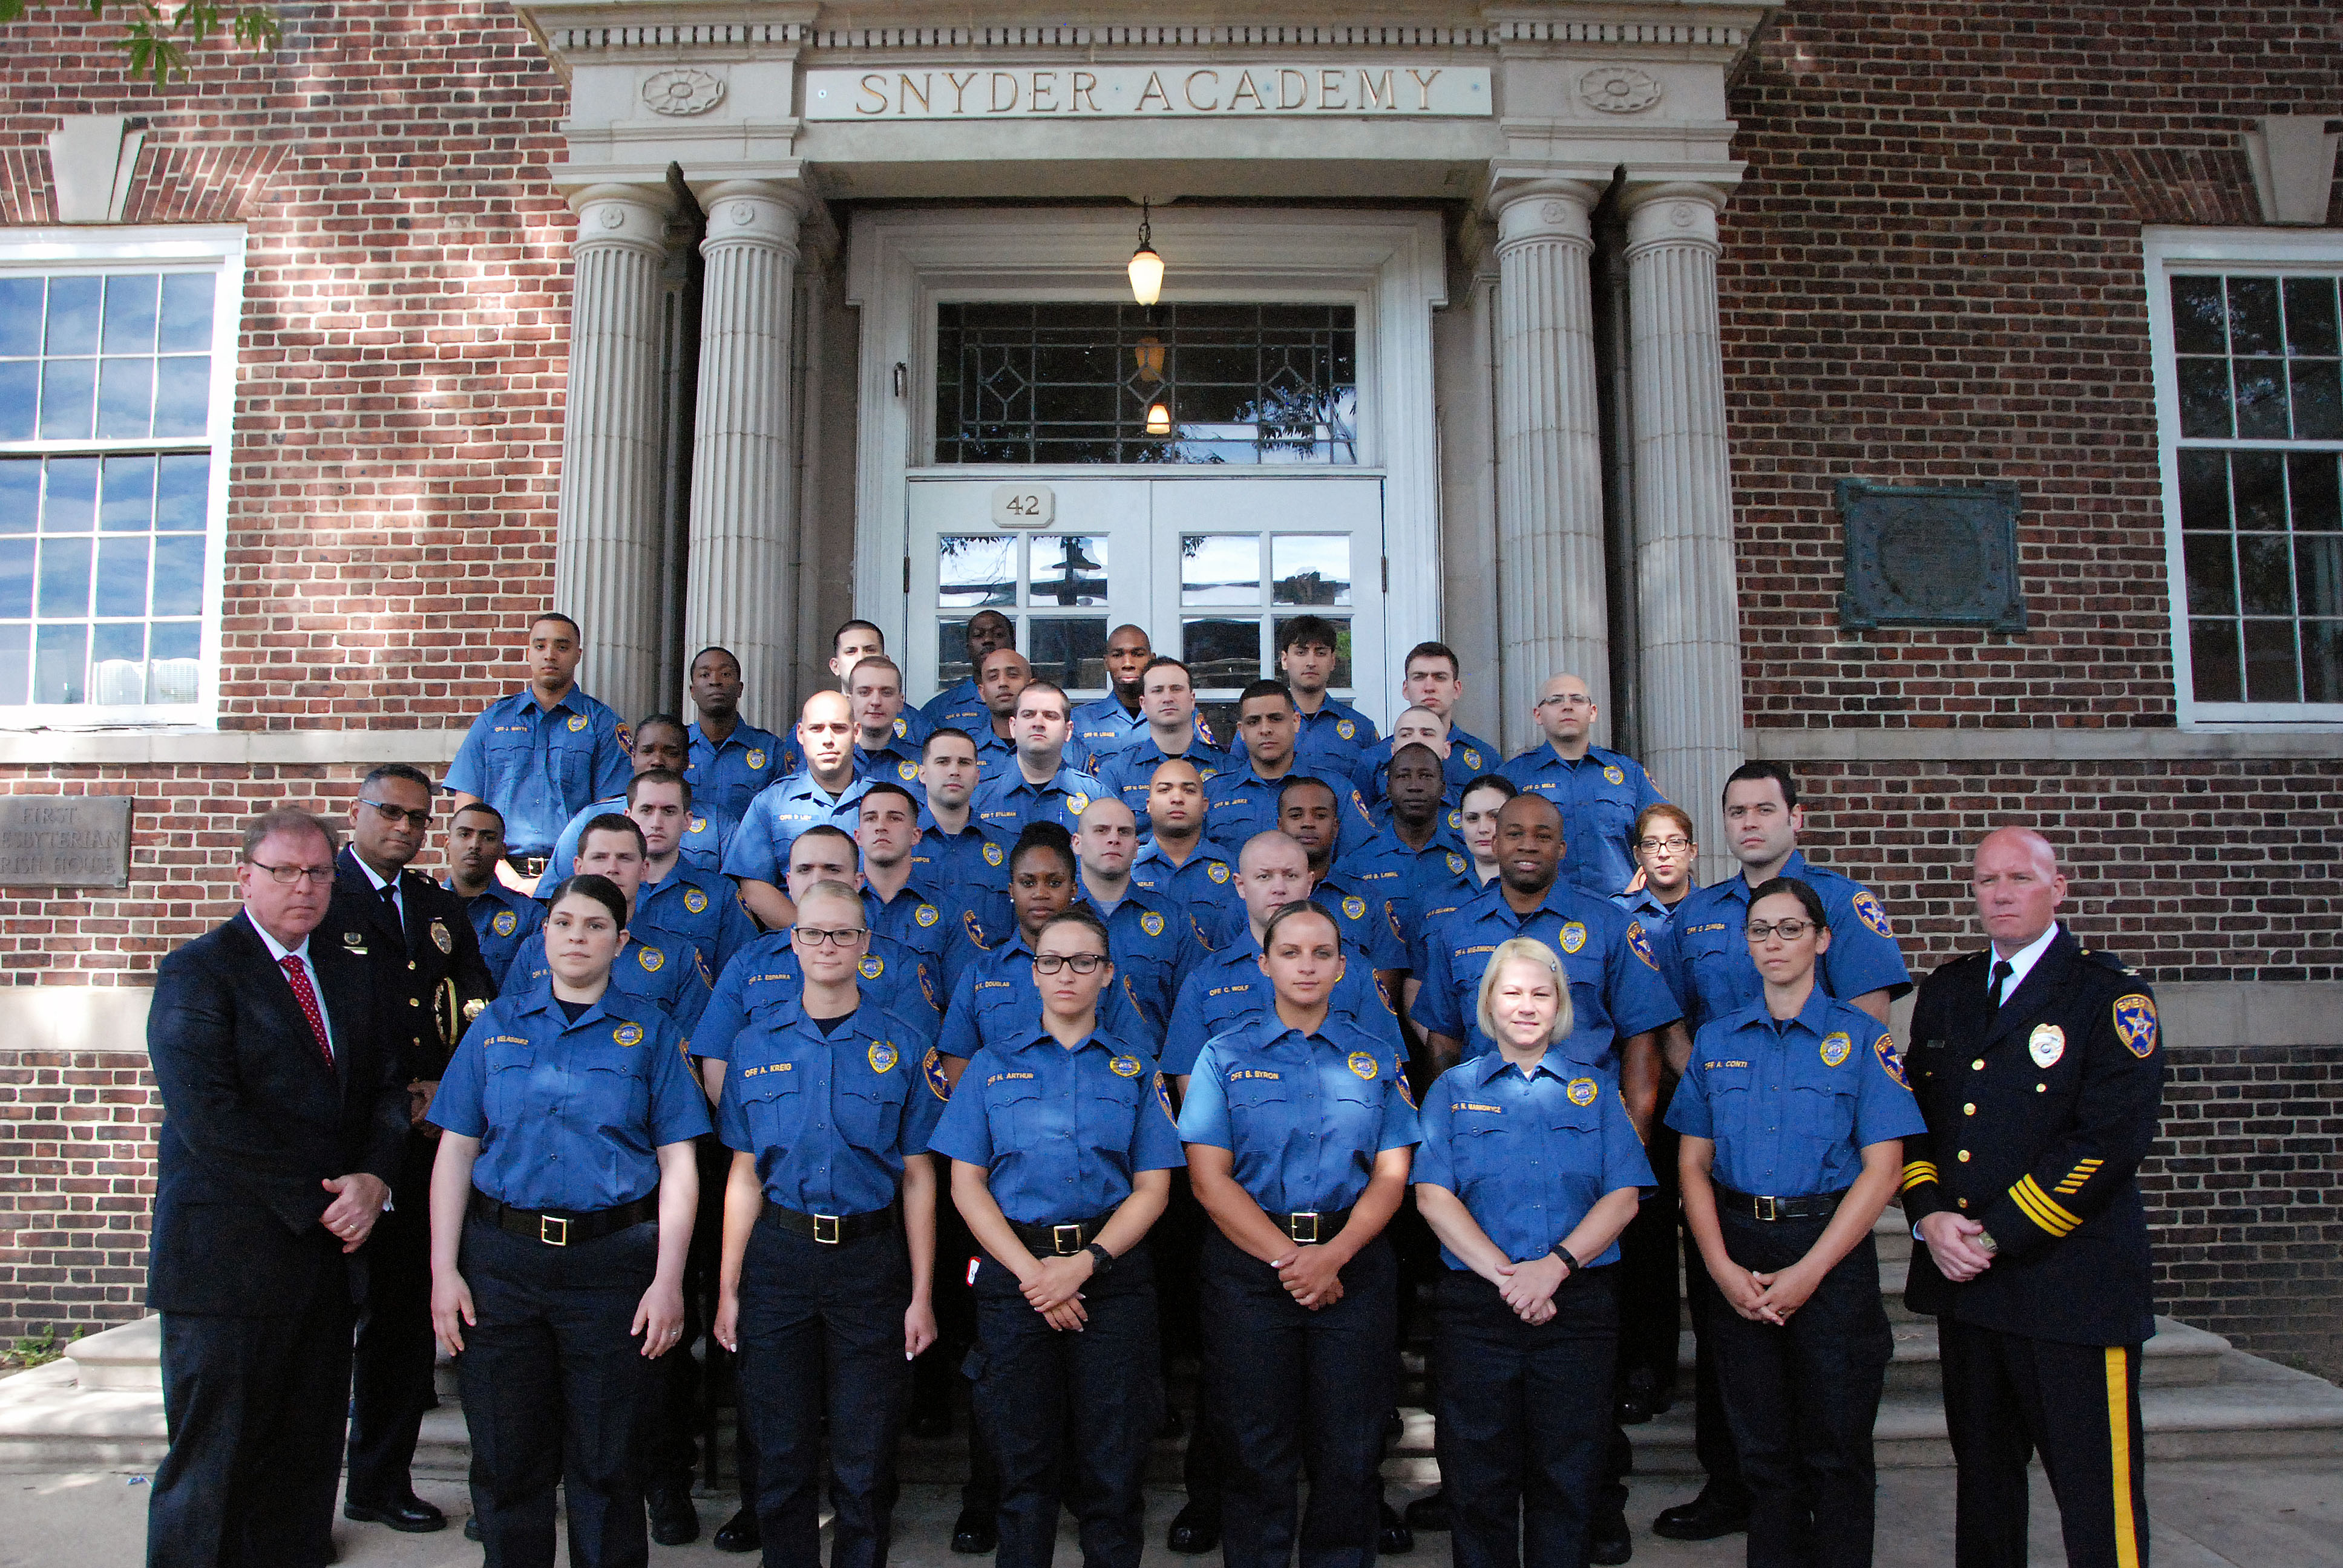 ebf82dcb9f45b0787013_6fe236c7a654342715fc_Sheriff_s_Officers_6-2016.jpg